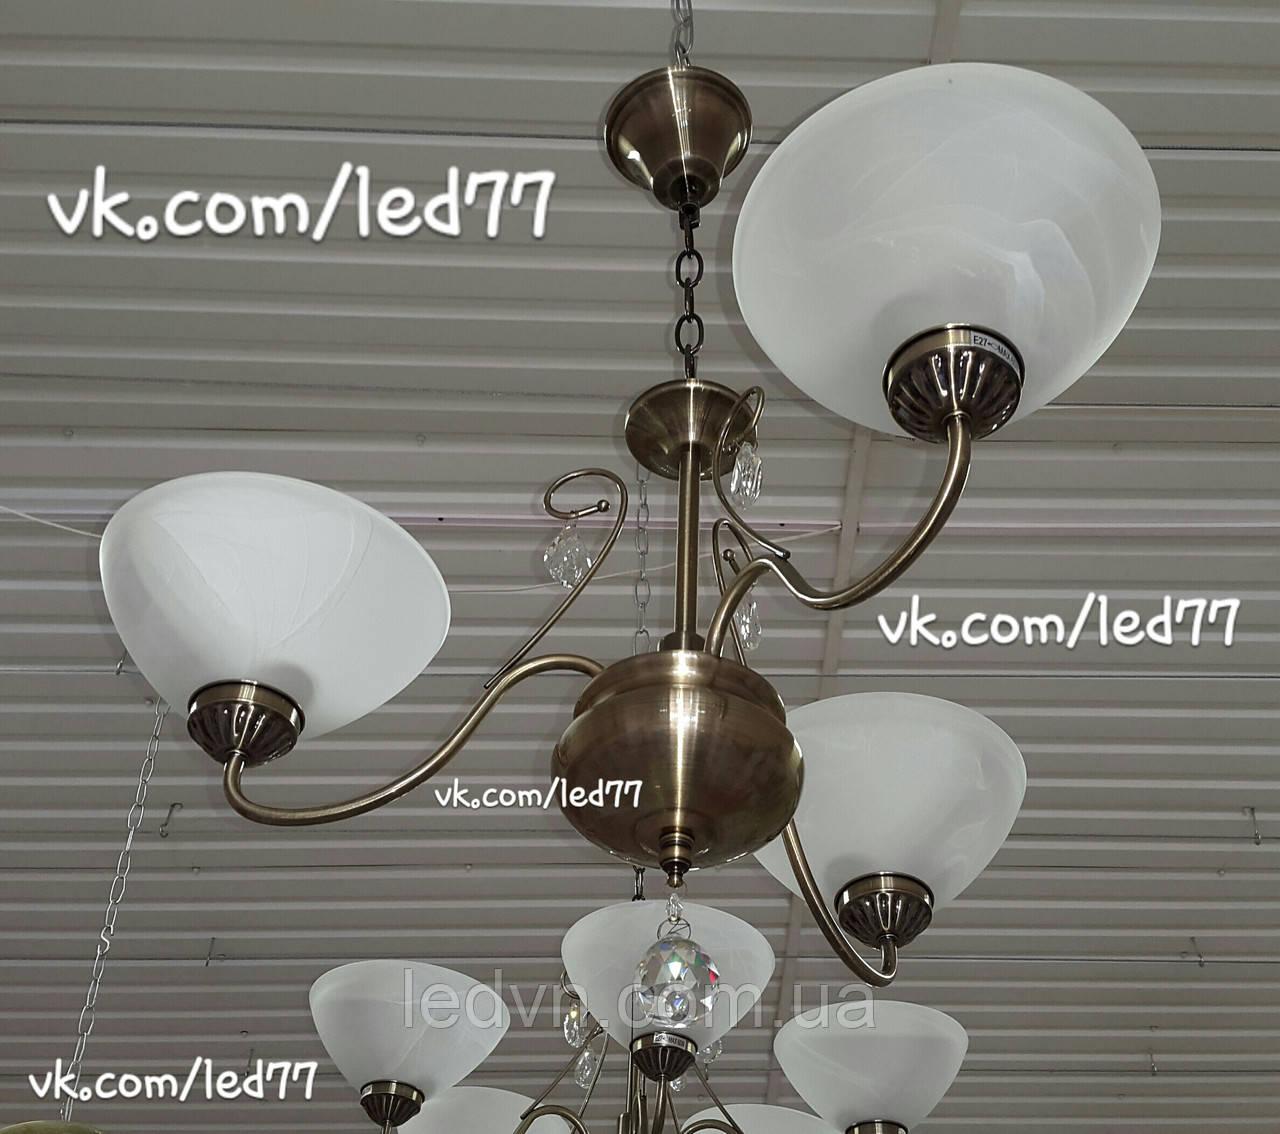 Класична люстра на ланцюгу на 3 лампи з елементами кришталю